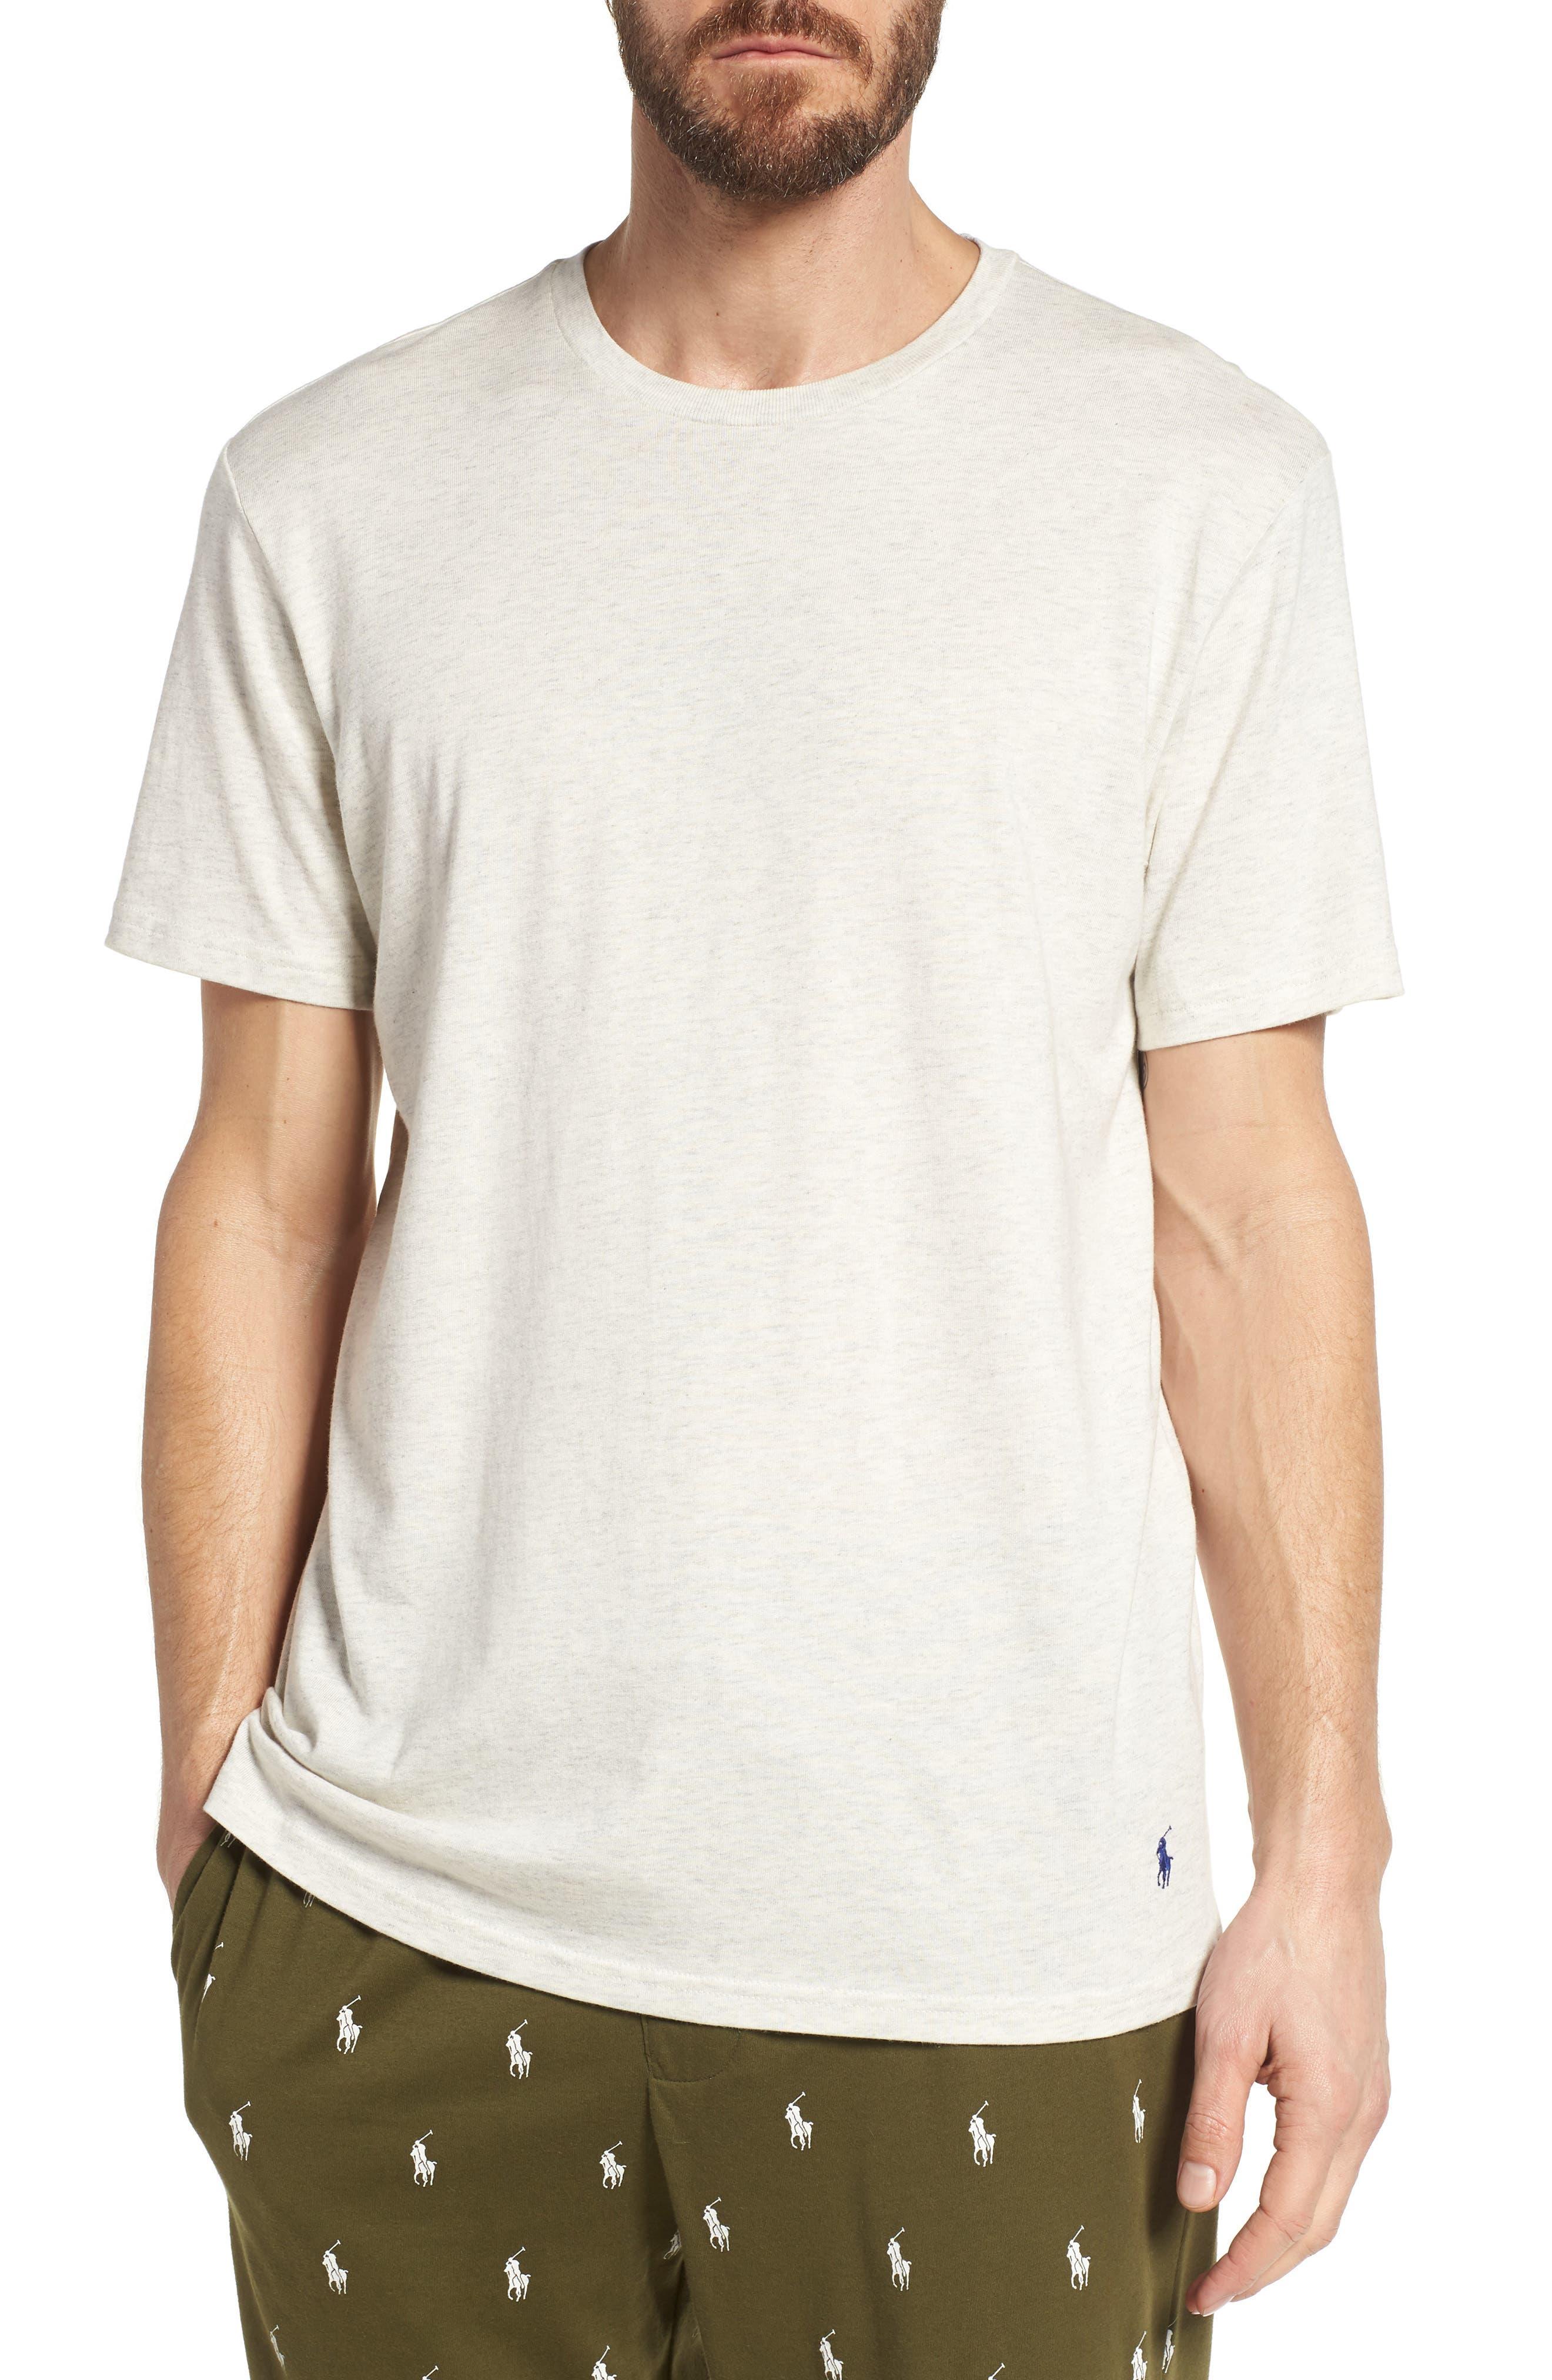 Supreme Comfort Crewneck T-Shirt,                         Main,                         color, 026